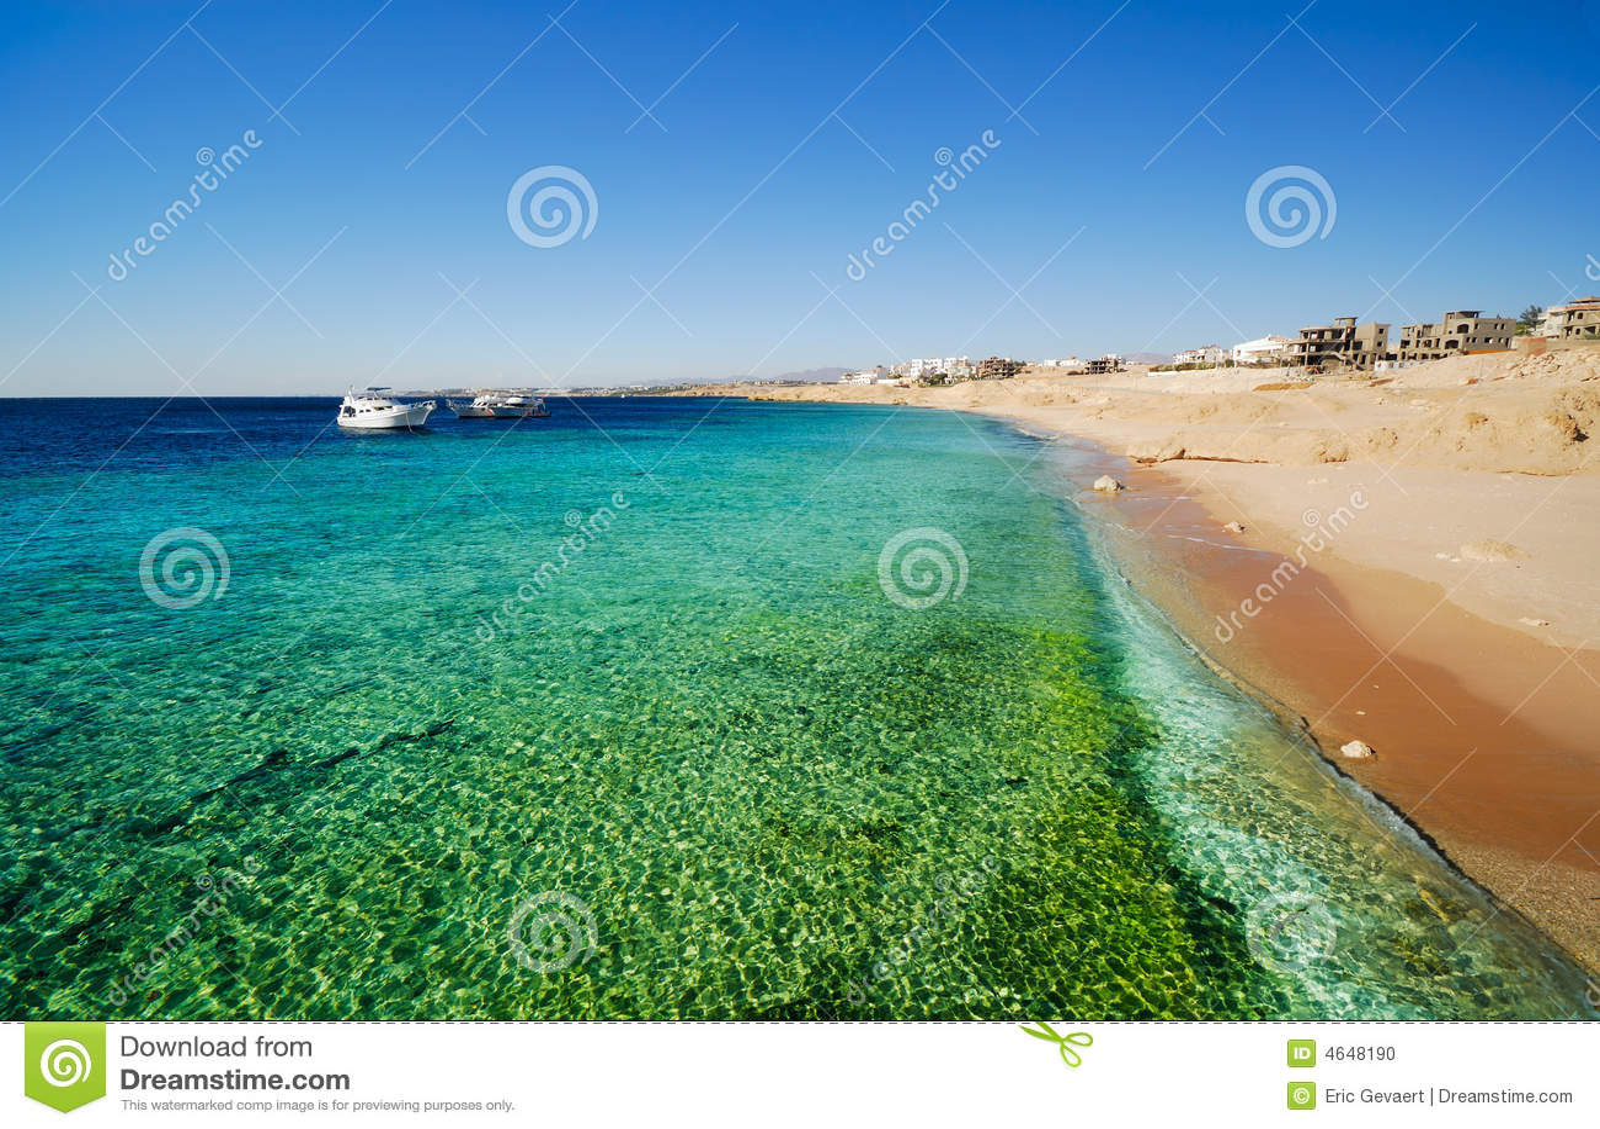 Il litorale di Sharm El Sheikh